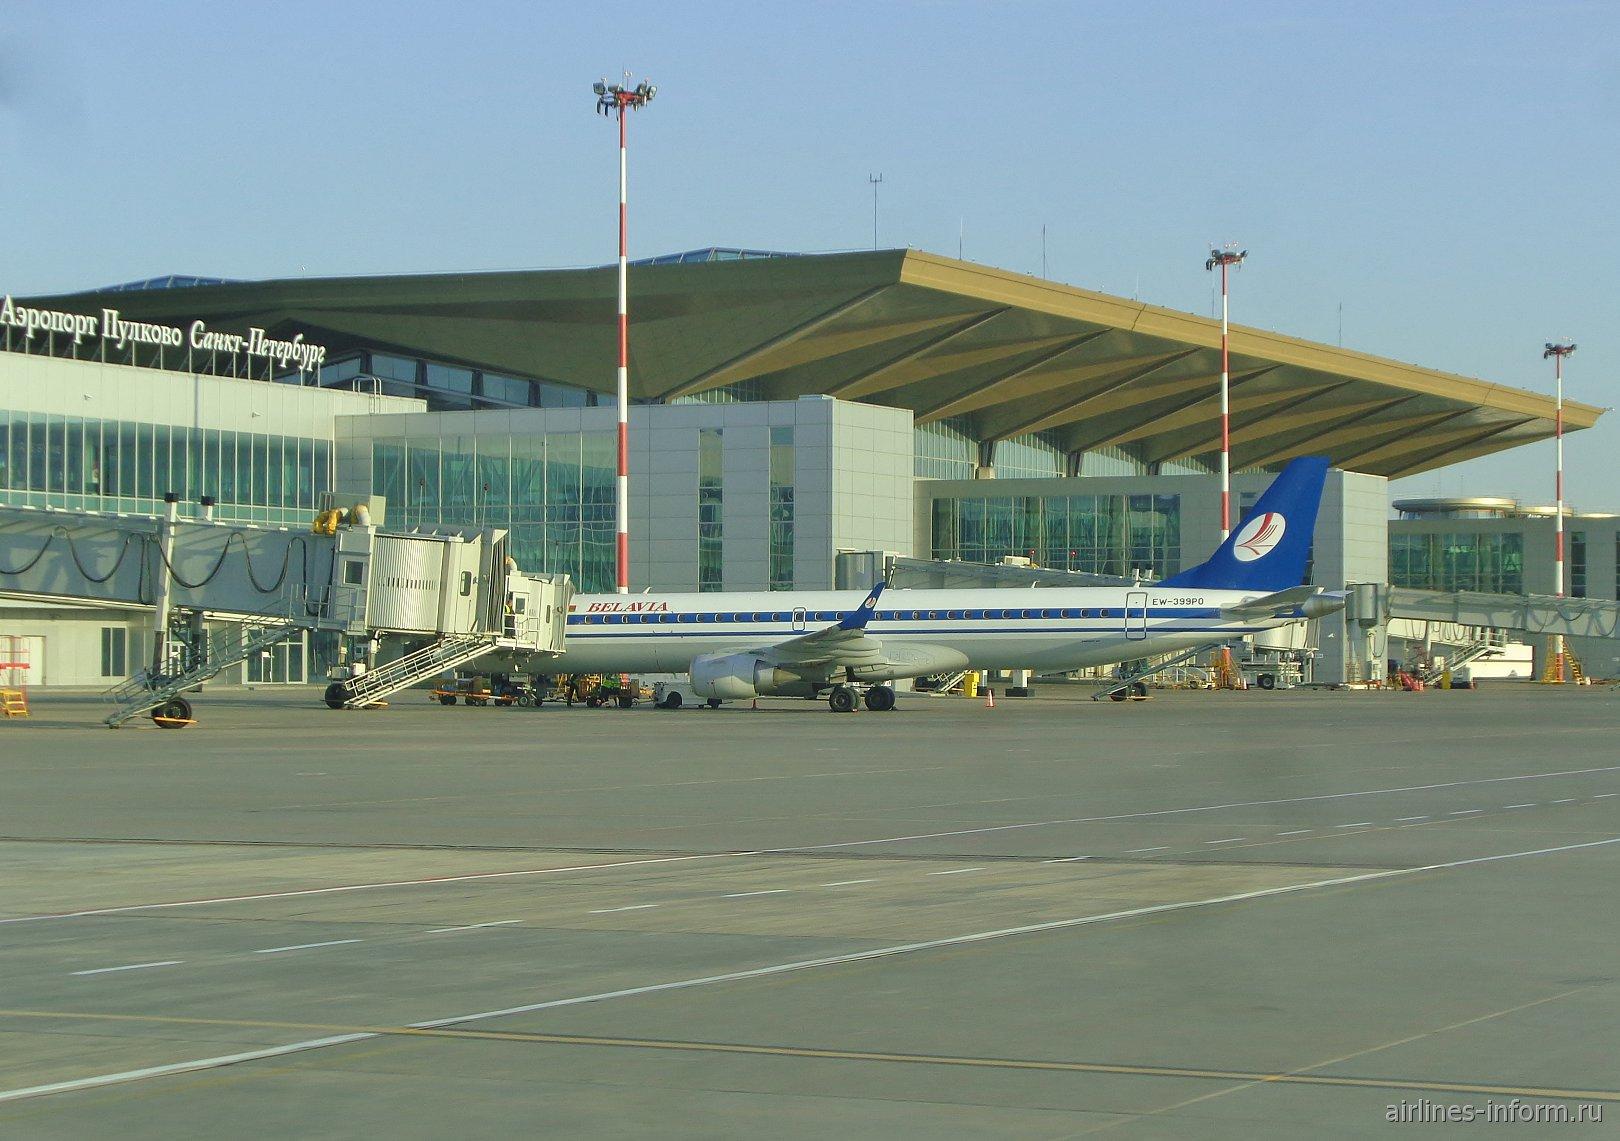 Вид с перрона на пассажирский терминал аэропорта Санкт-Петербург Пулково